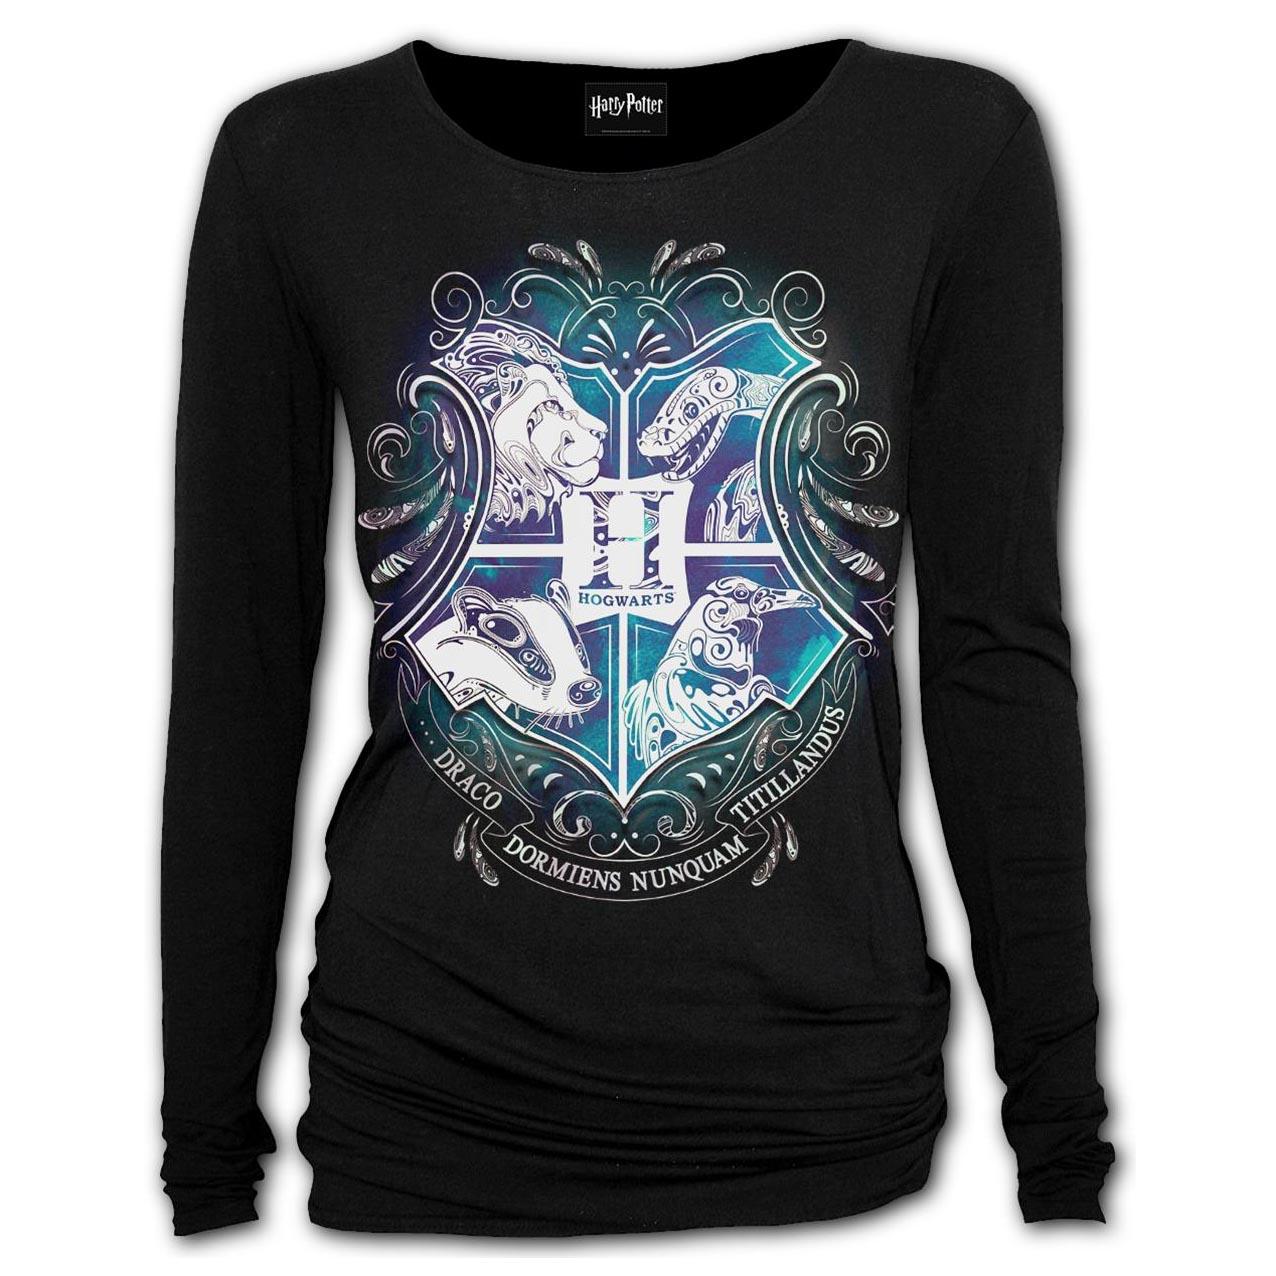 Spiral-Ladies-Black-Harry-Potter-HOGWARTS-Crest-L-Sleeve-Top-All-Sizes thumbnail 3